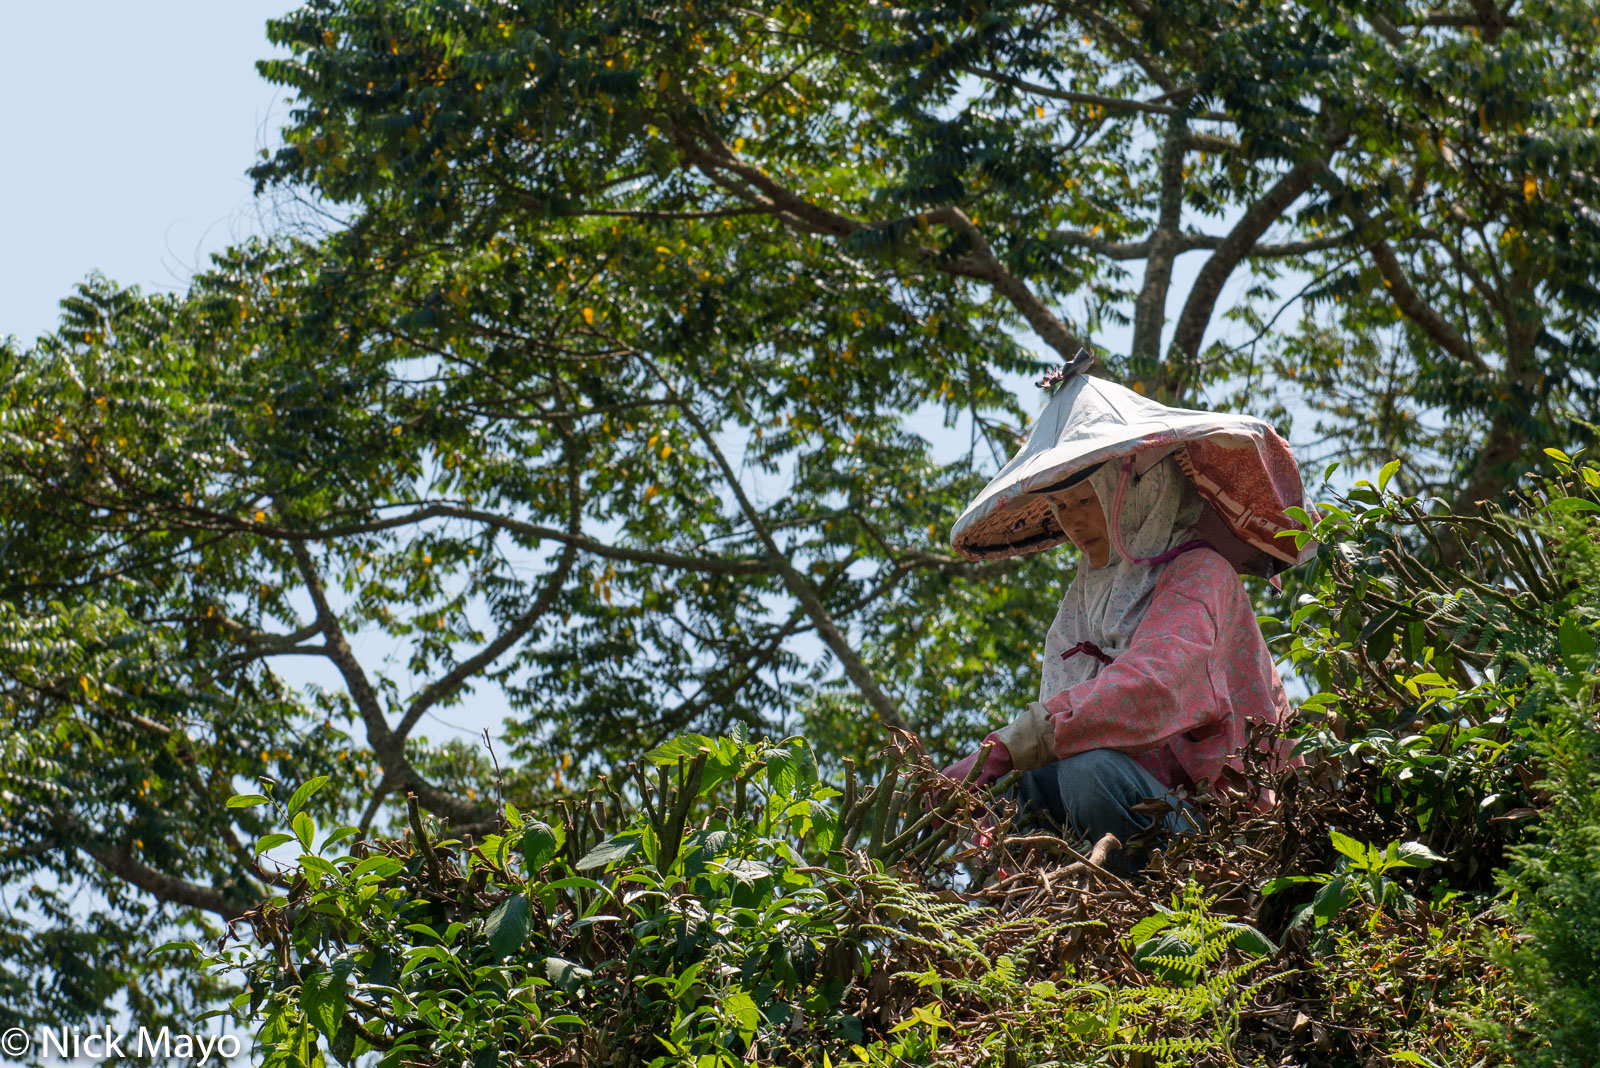 A farmer cutting back old bushes at a Ruili tea plantation.